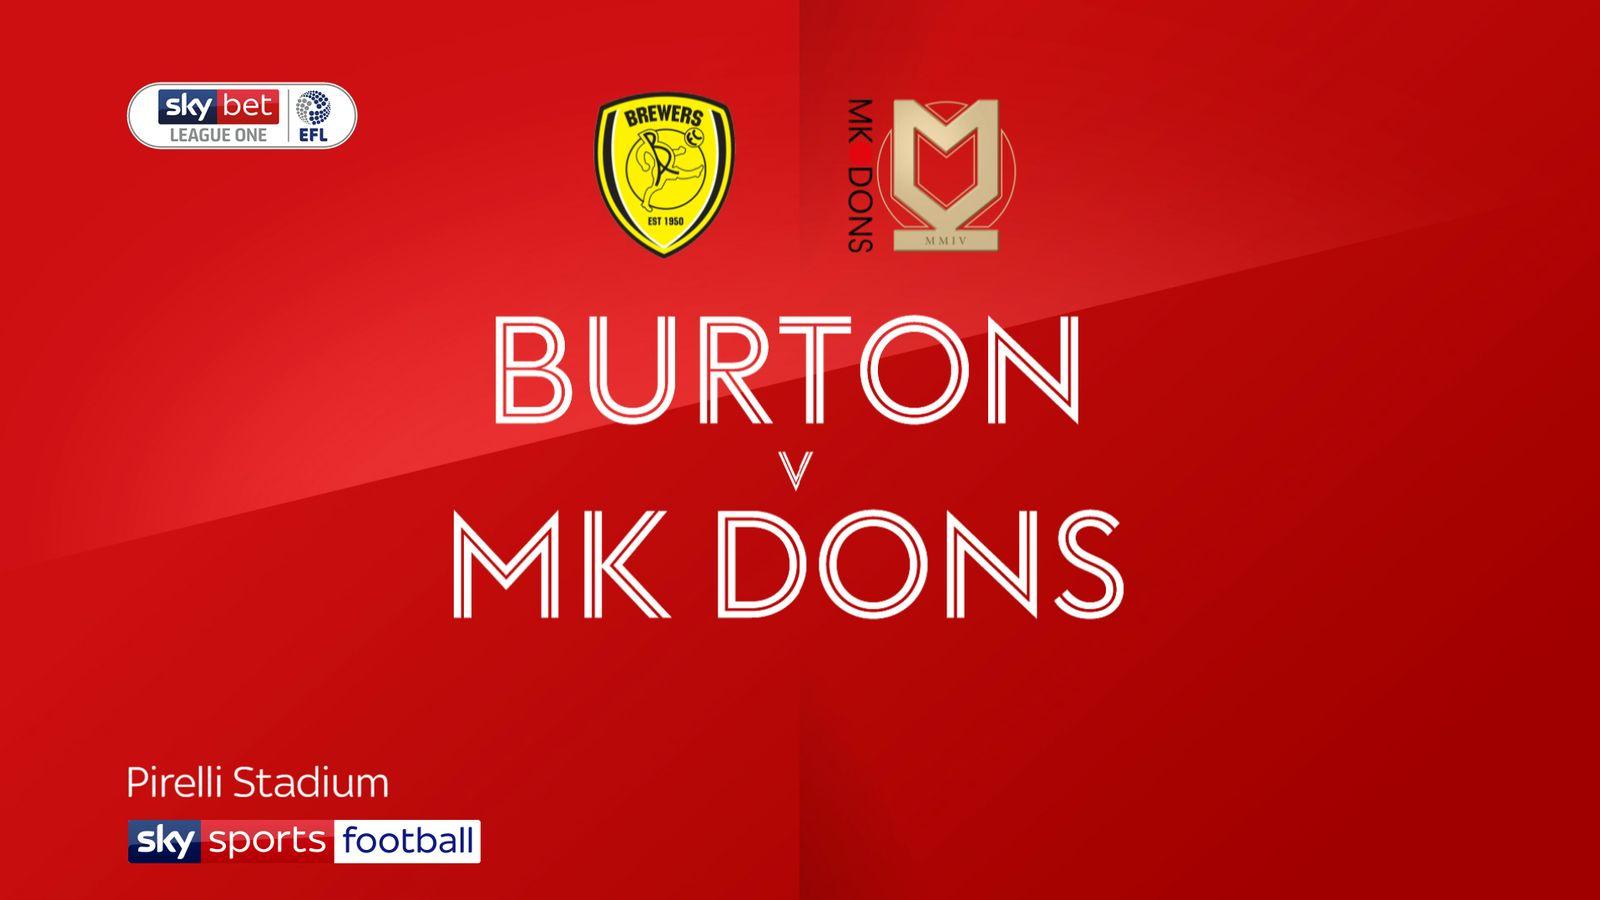 Burton 1-0 MK Dons: Liam Boyce secures victory